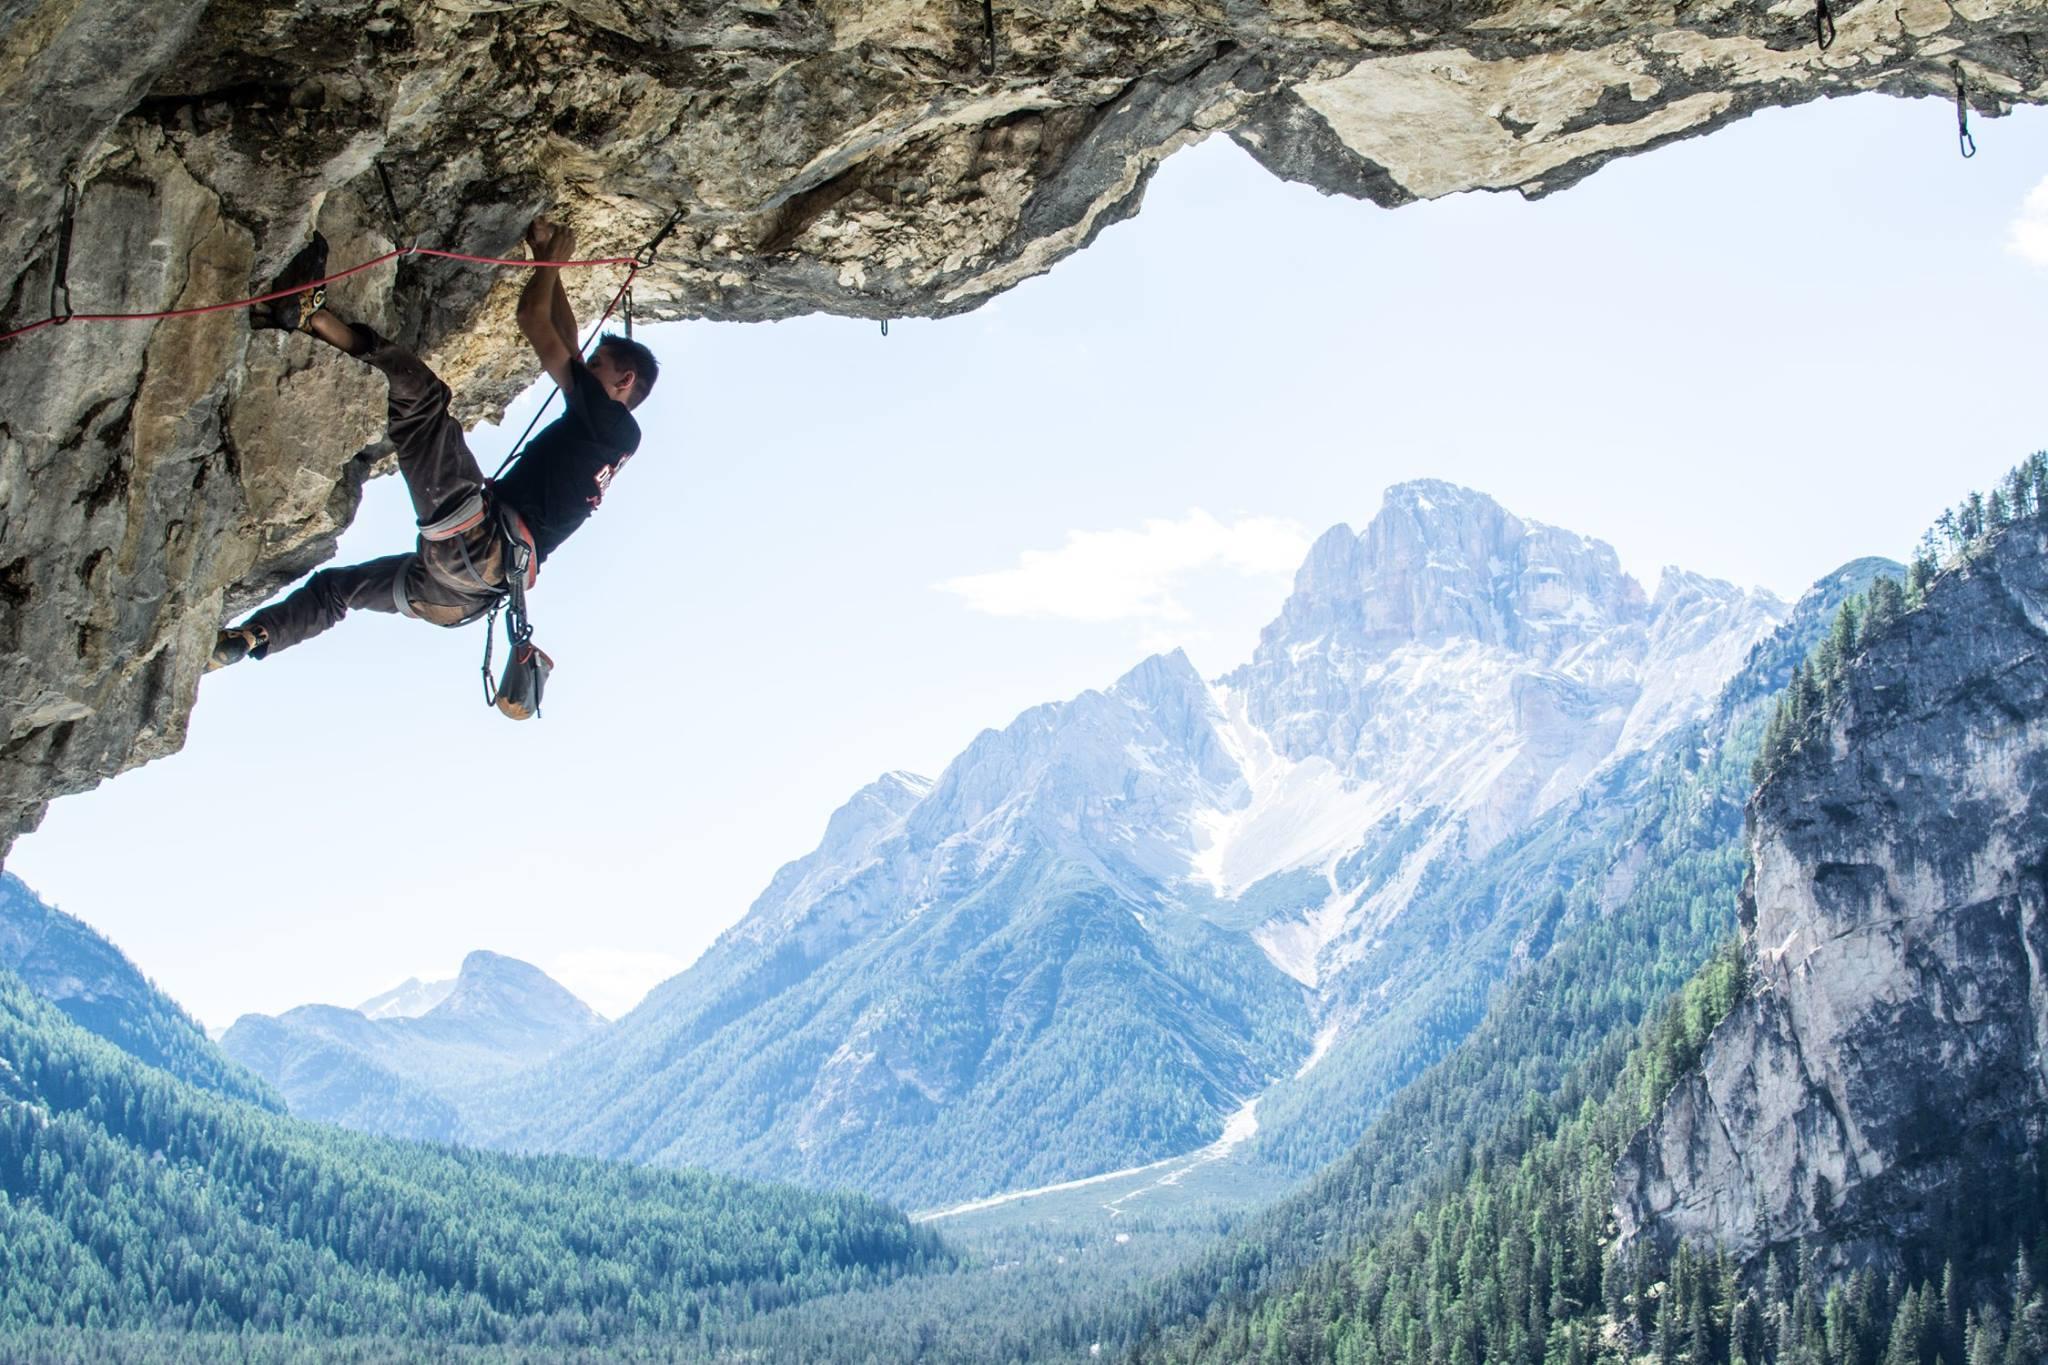 Petzl Rock Climbing Climber Vinyl Decal Sticker Mountain Climb Car Laptop Truck